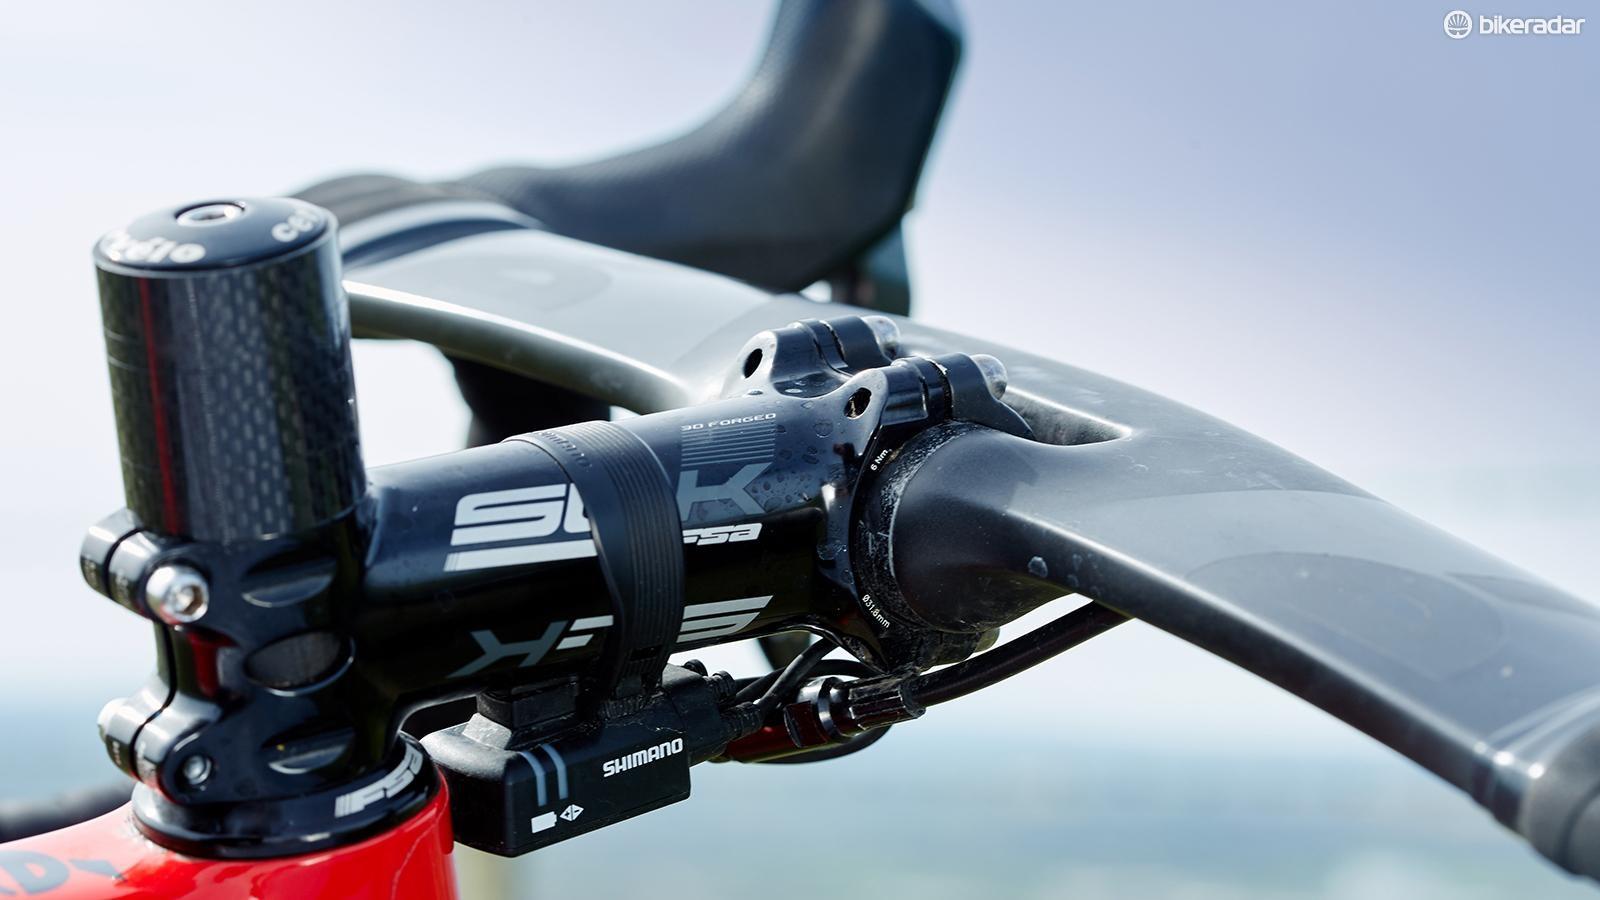 FSA SL-K stem holds the own-brand aero handlebar